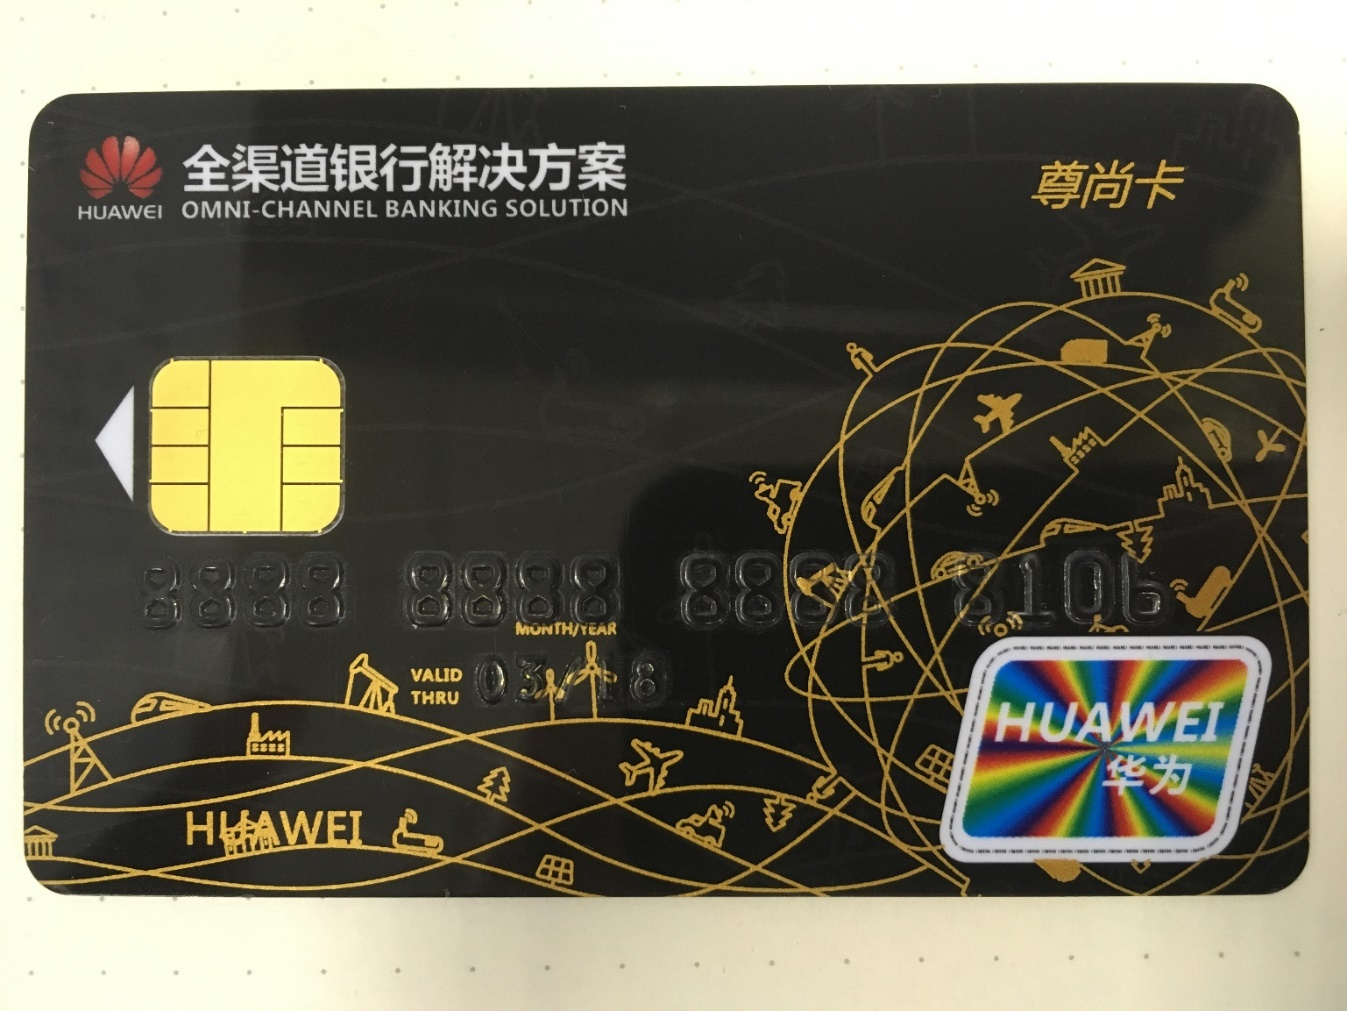 Китай — цифровая держава. Впечатления от Huawei Connect 2017 - 15